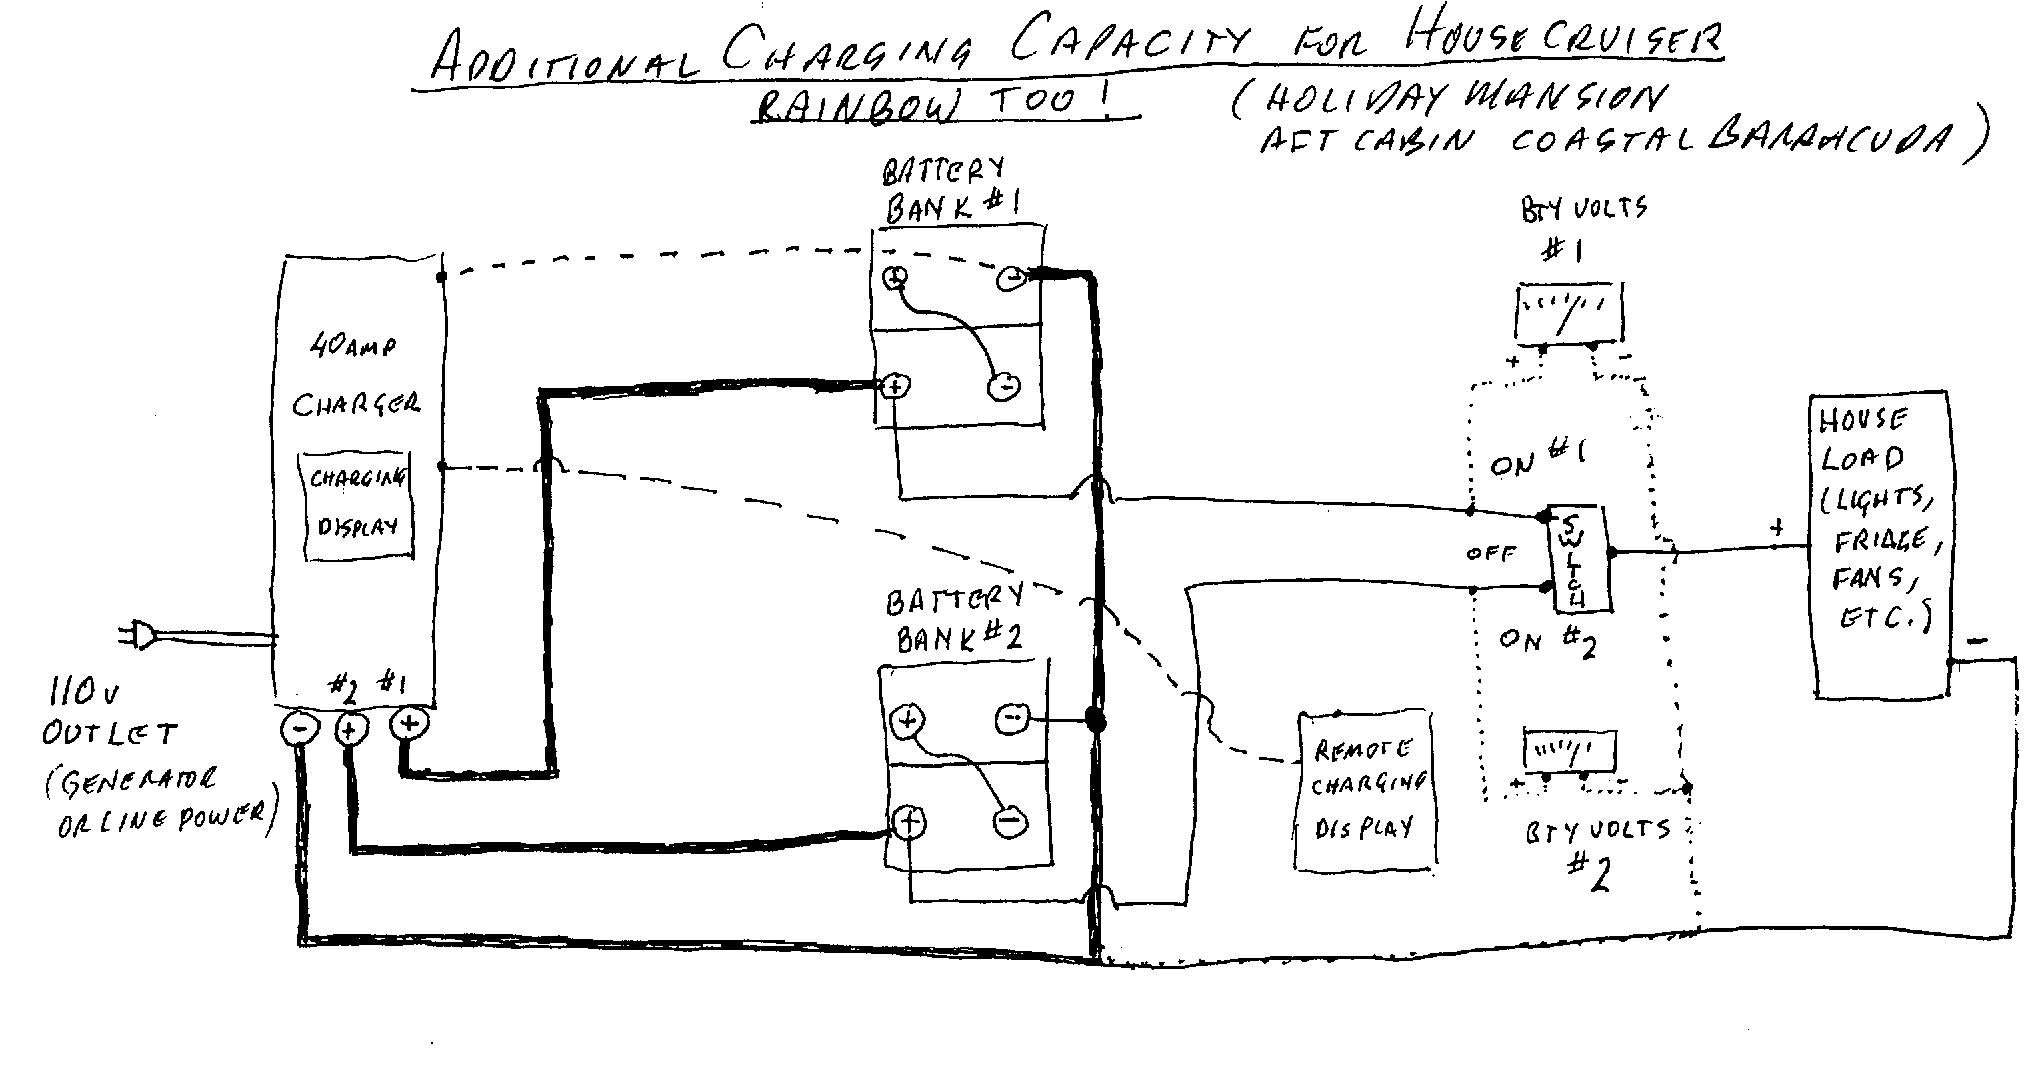 Wiring Diagram 1995 Fleetwood Storm Trusted Diagrams Rv Fiesta Schematic